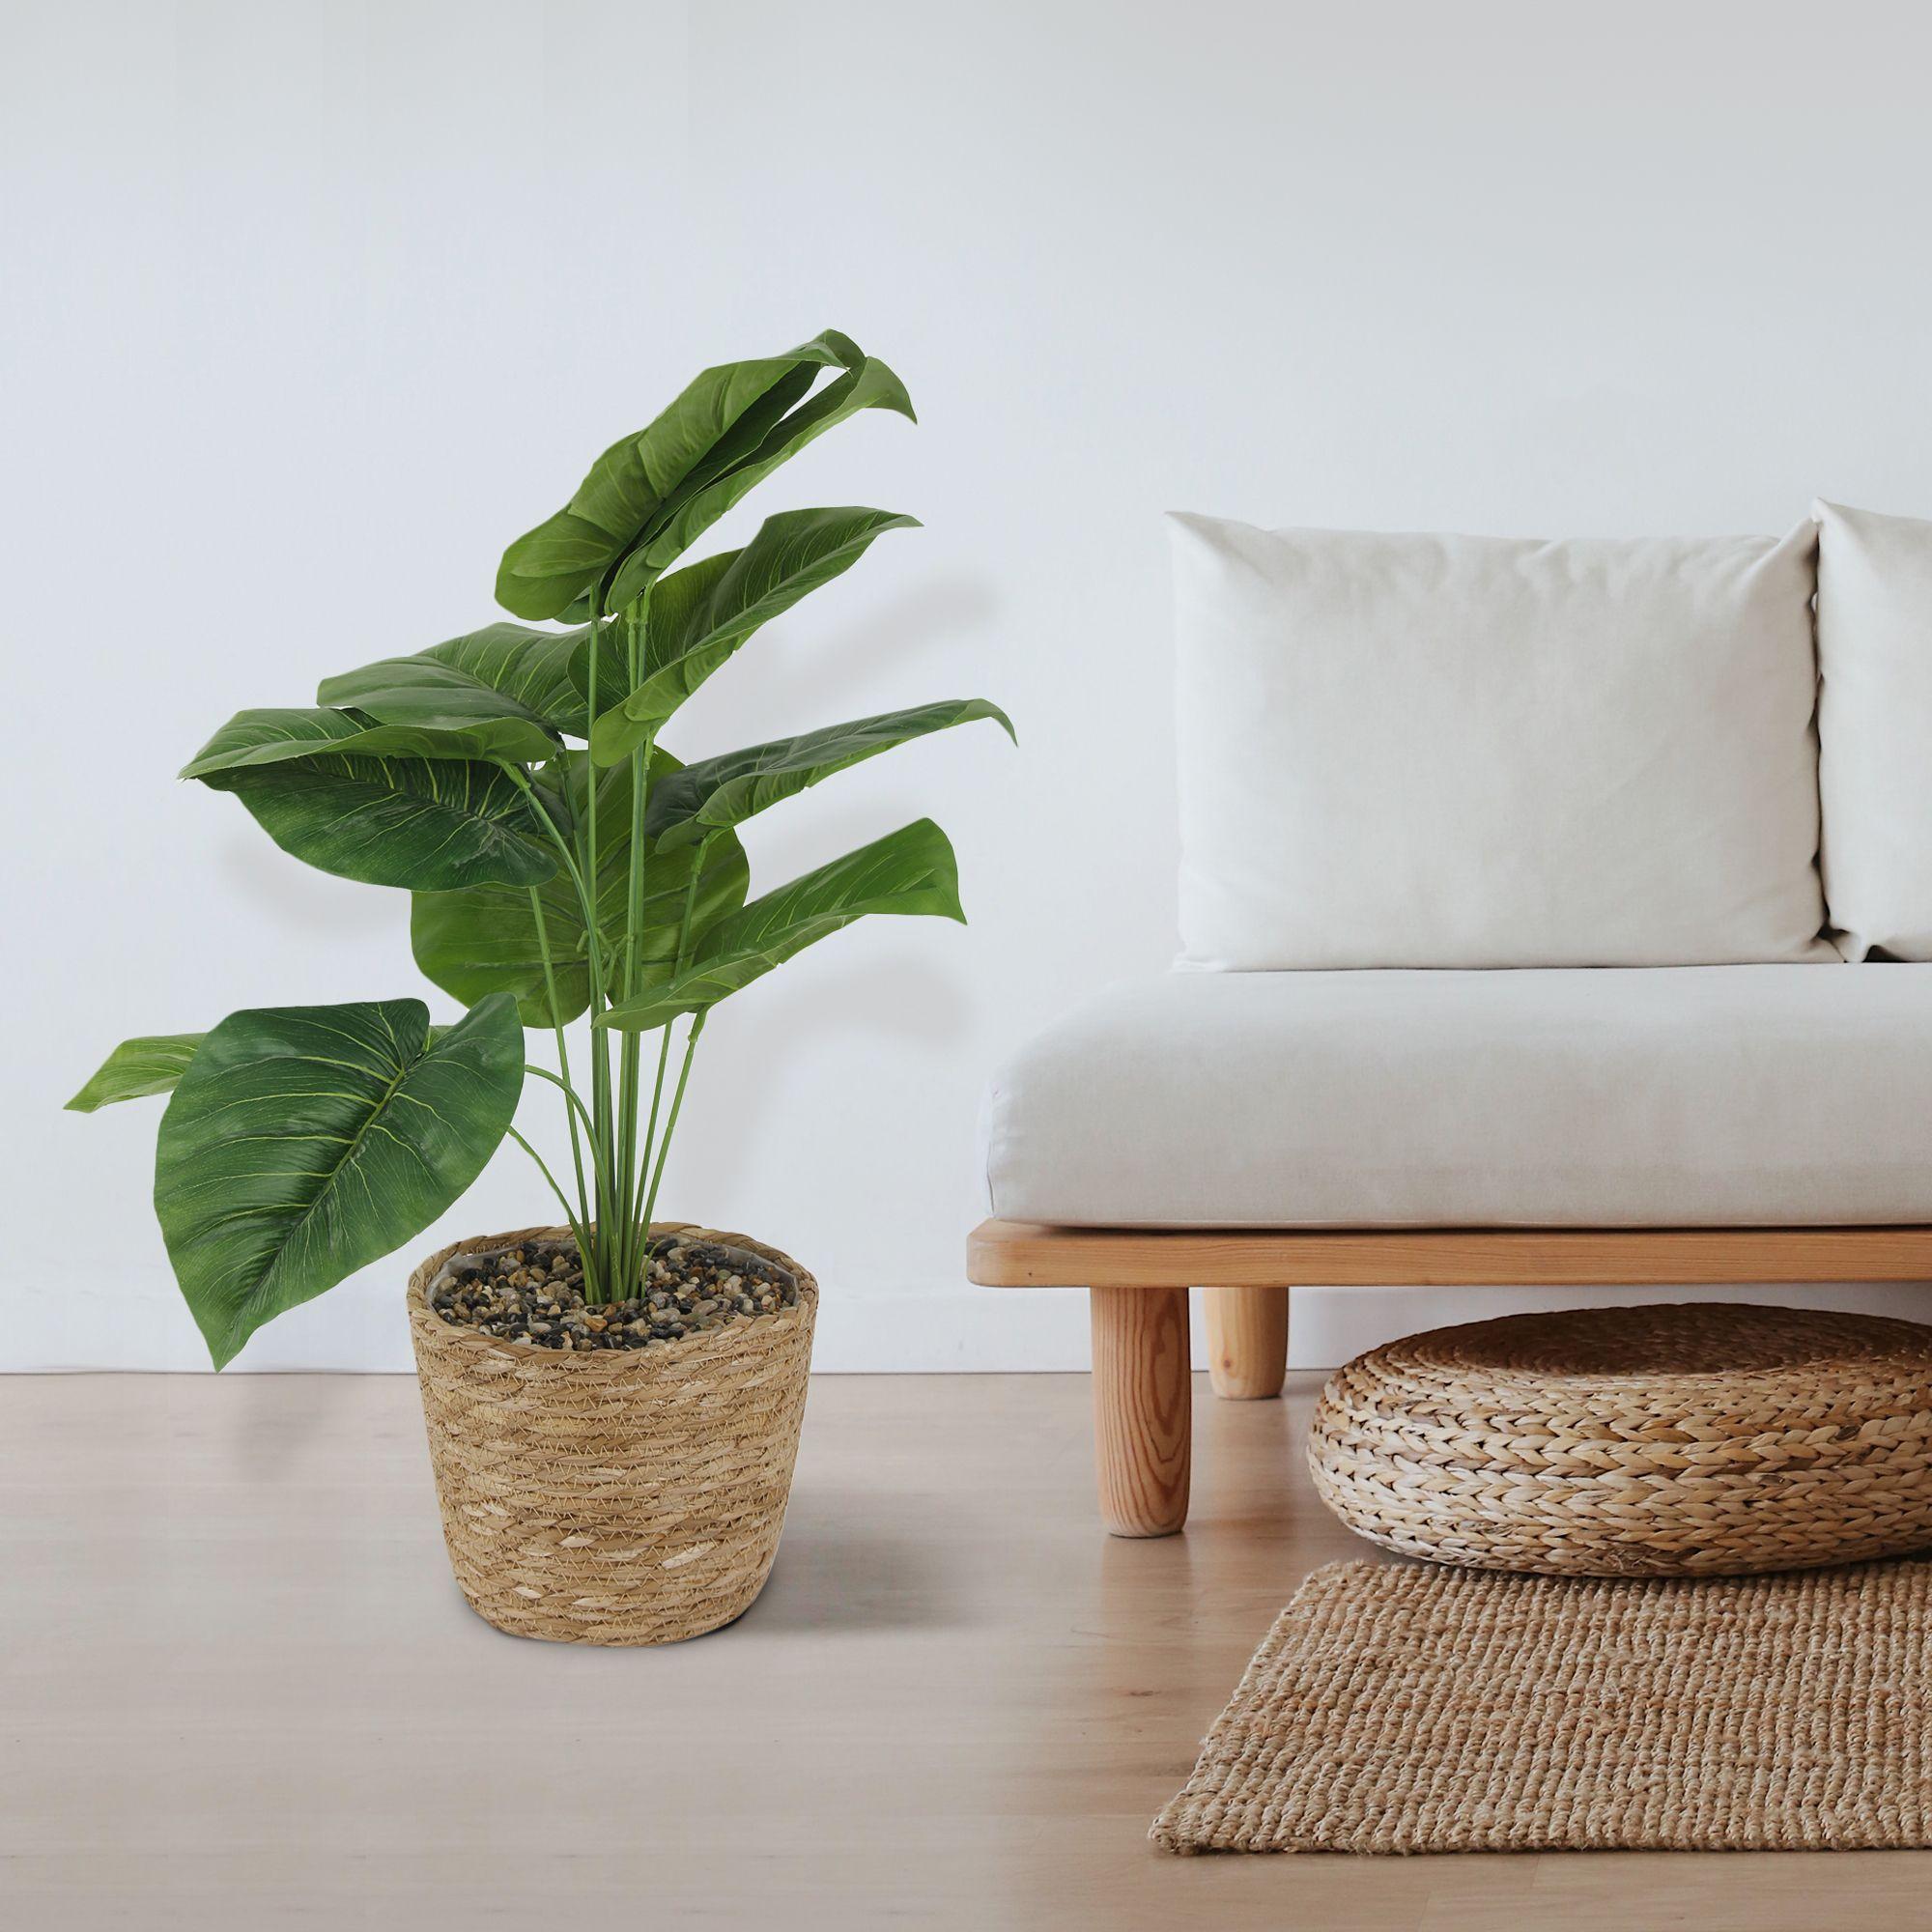 #fakeplantsdecor #colorfulhomedecor #fakeplants #plantswithbasket #succulentindoor #giftideas #aestheticgreen #aestheticwalldecor #apartmentwalldecor #bigwalldecorlivingroom #roomdecor #roomdecoration #roomdecorideas